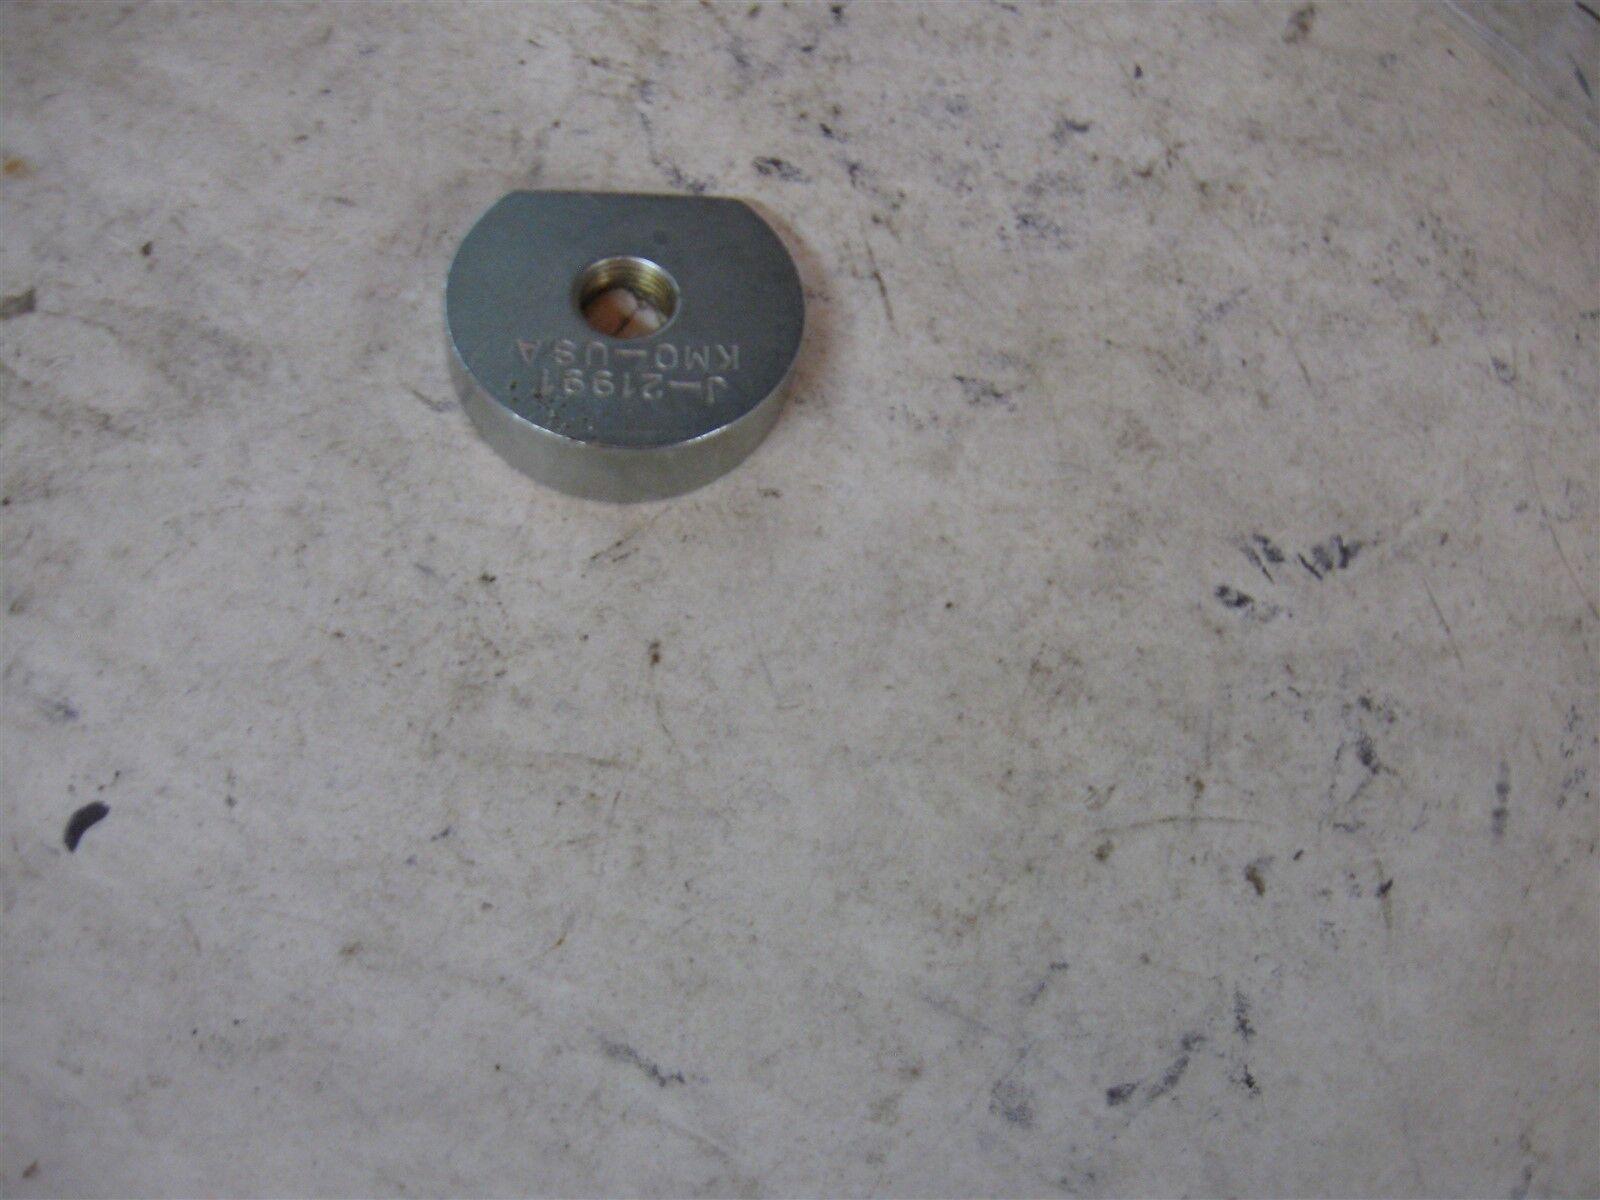 KENT MOORE J-21991 CARRIER BUSHING REMOVER REPAIR CORVETTE CHEVELLE CHEVY NICE